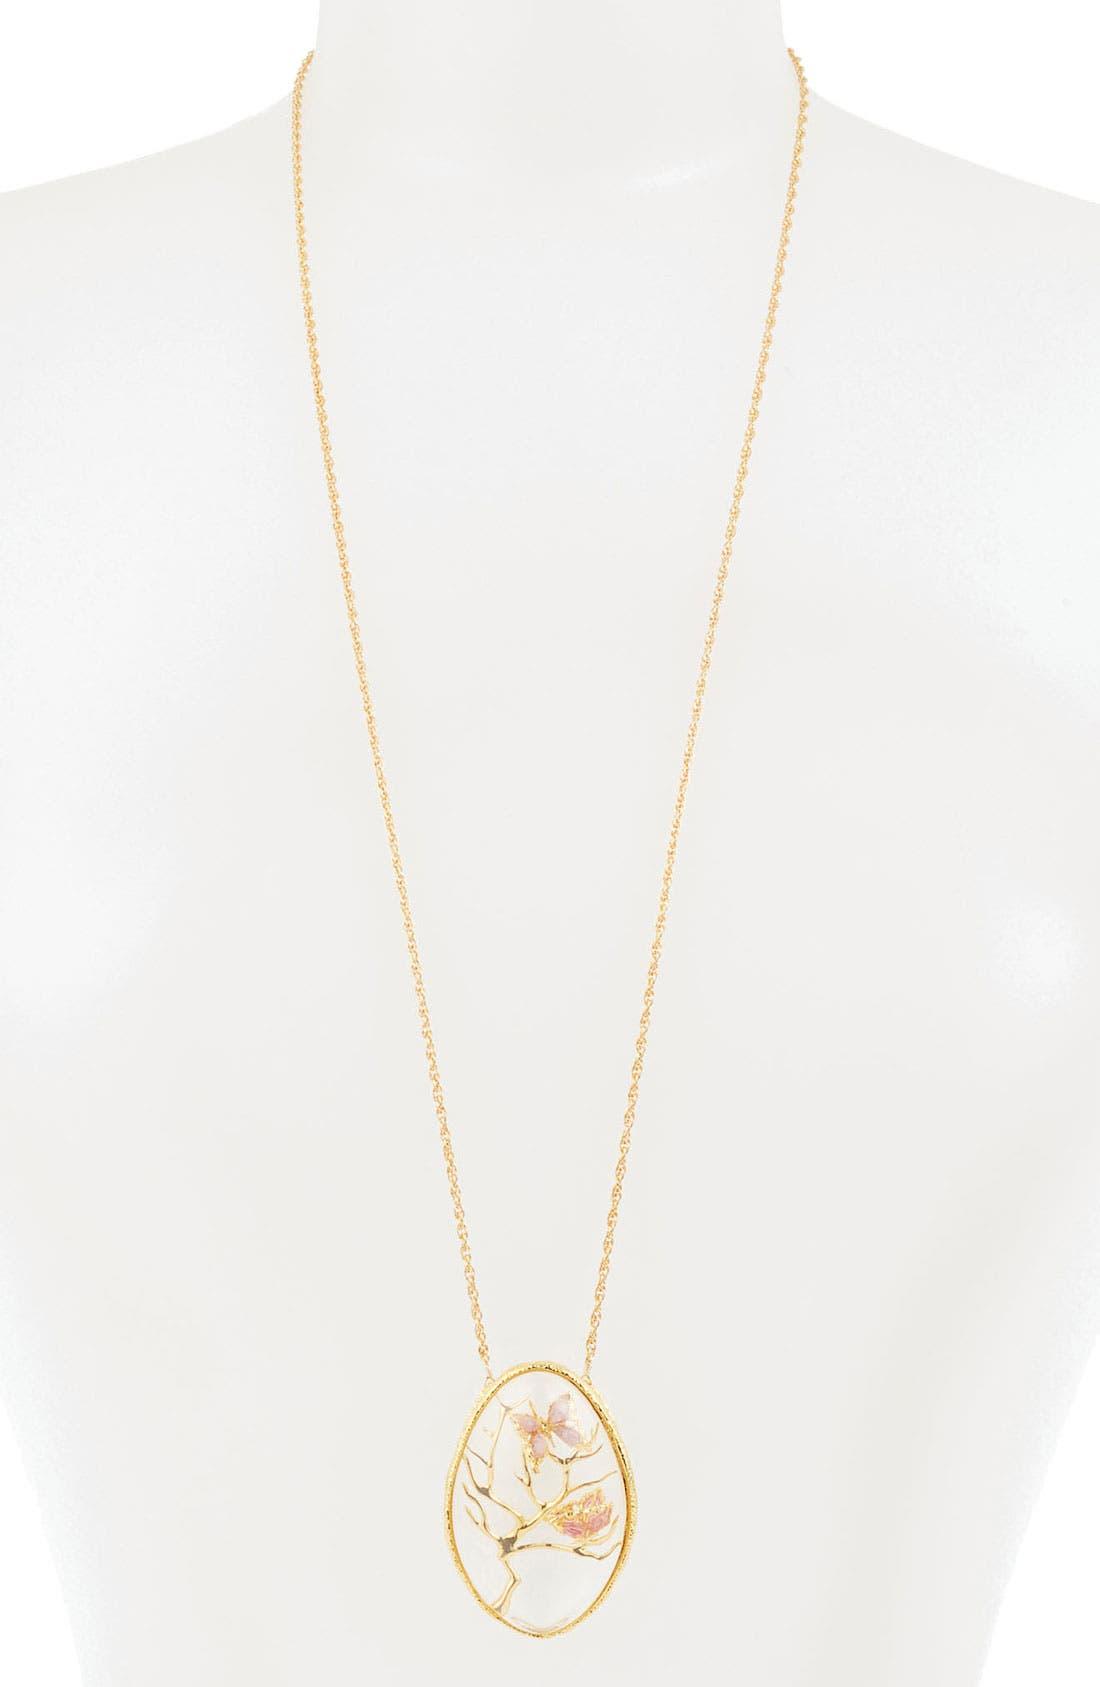 Alternate Image 1 Selected - Alexis Bittar 'Elements - Floral' Long Pendant Necklace